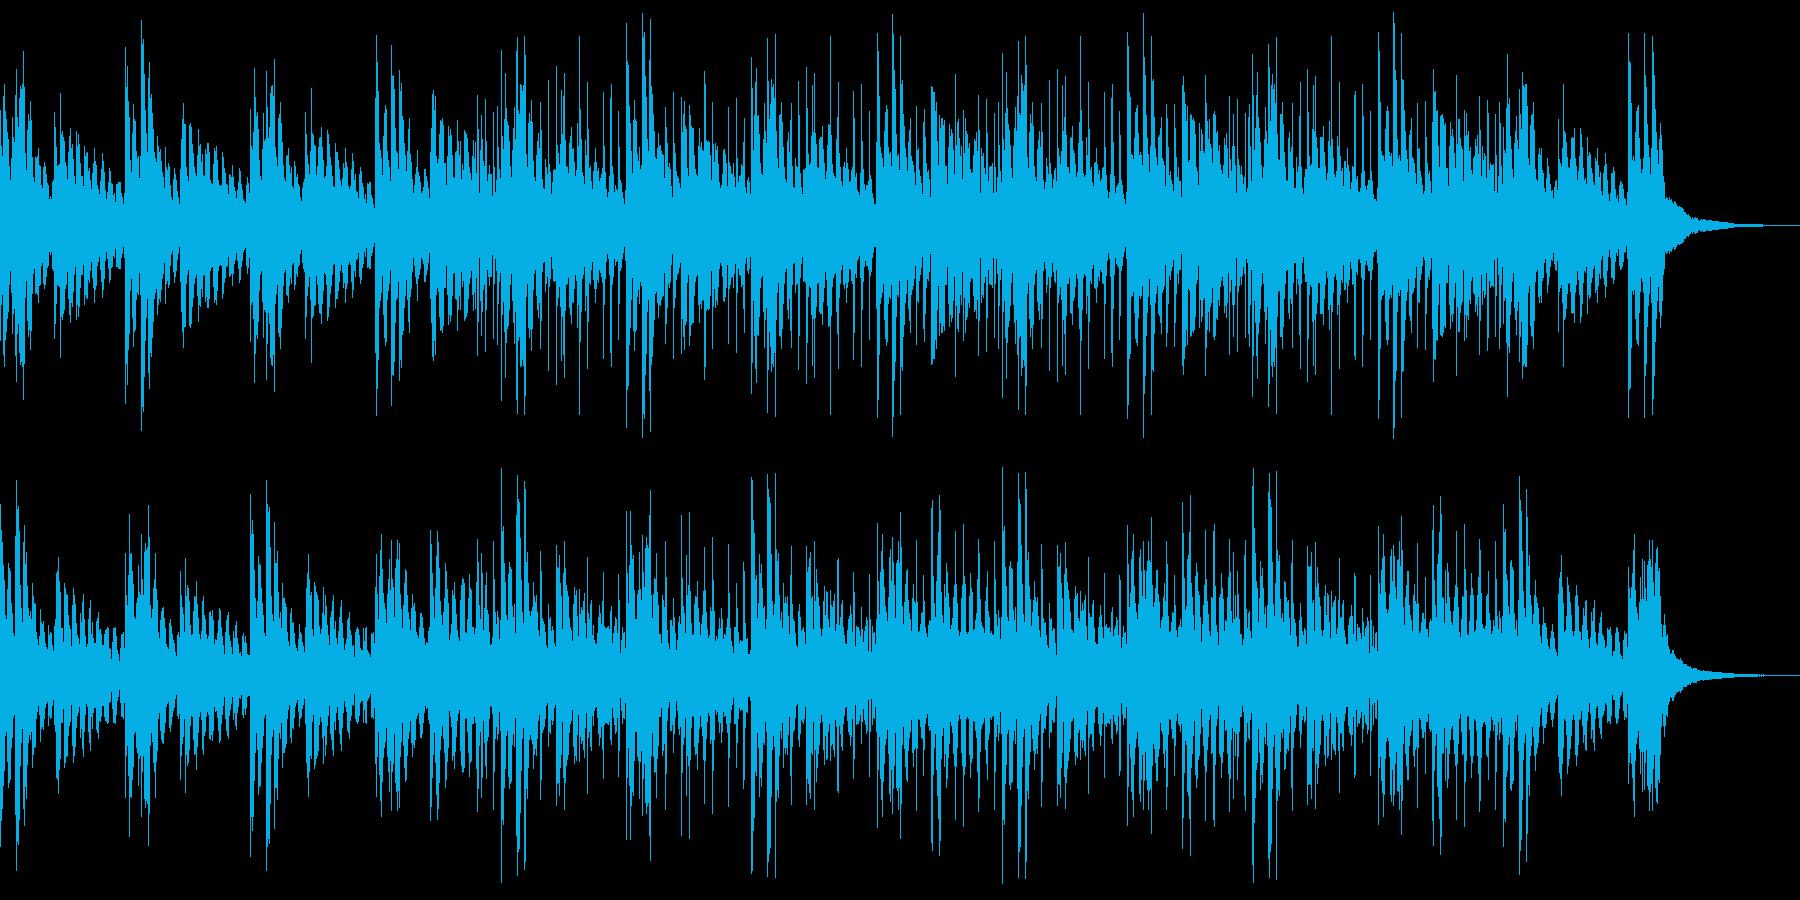 BGM 約1分 散策中 エレピの再生済みの波形